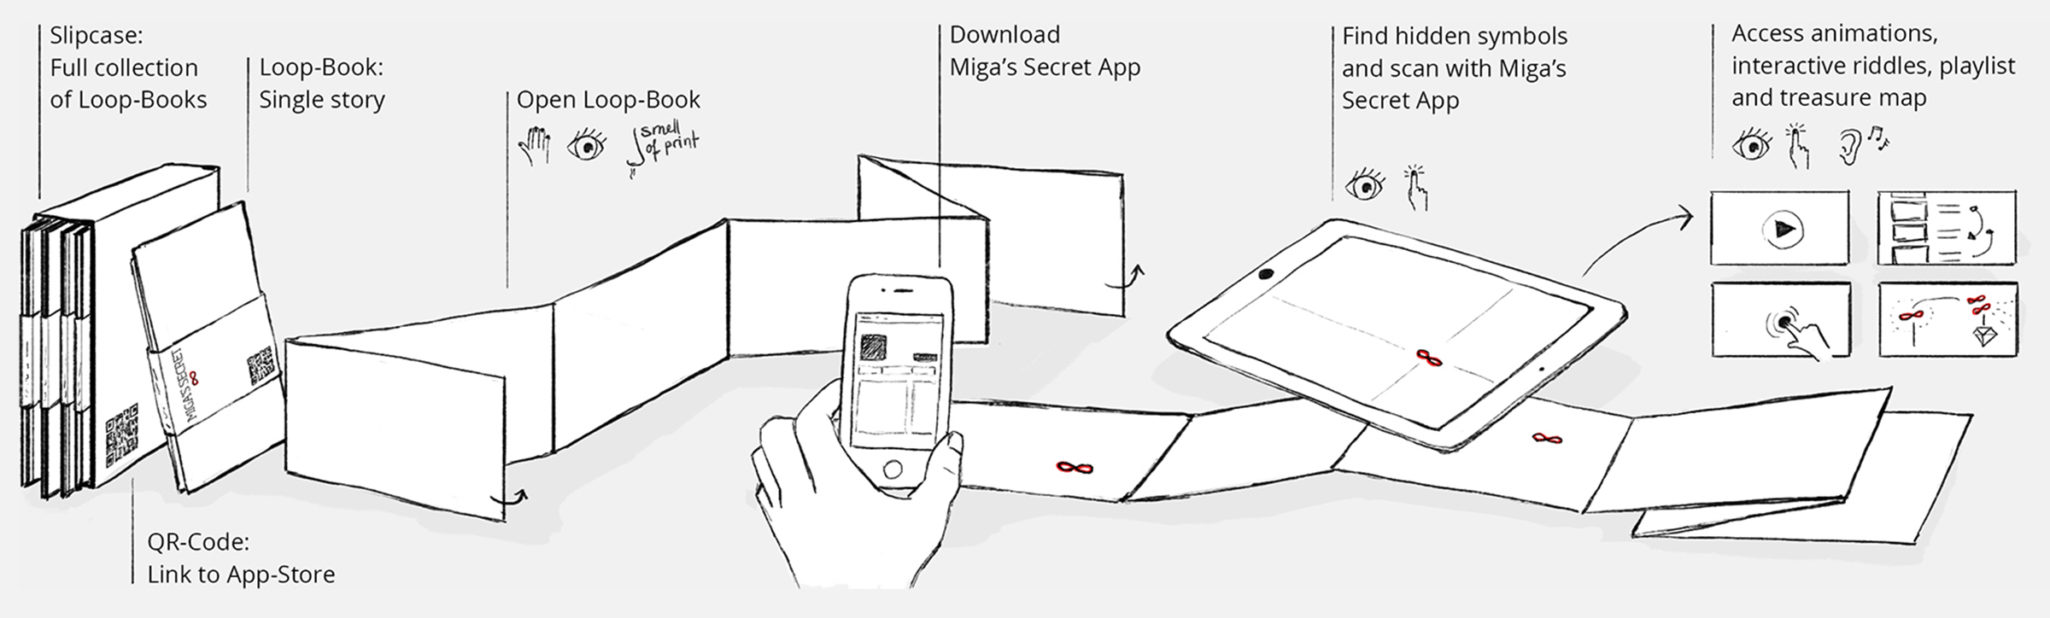 Concept illustration: Explain the concept of Miga's secret concertina books and app